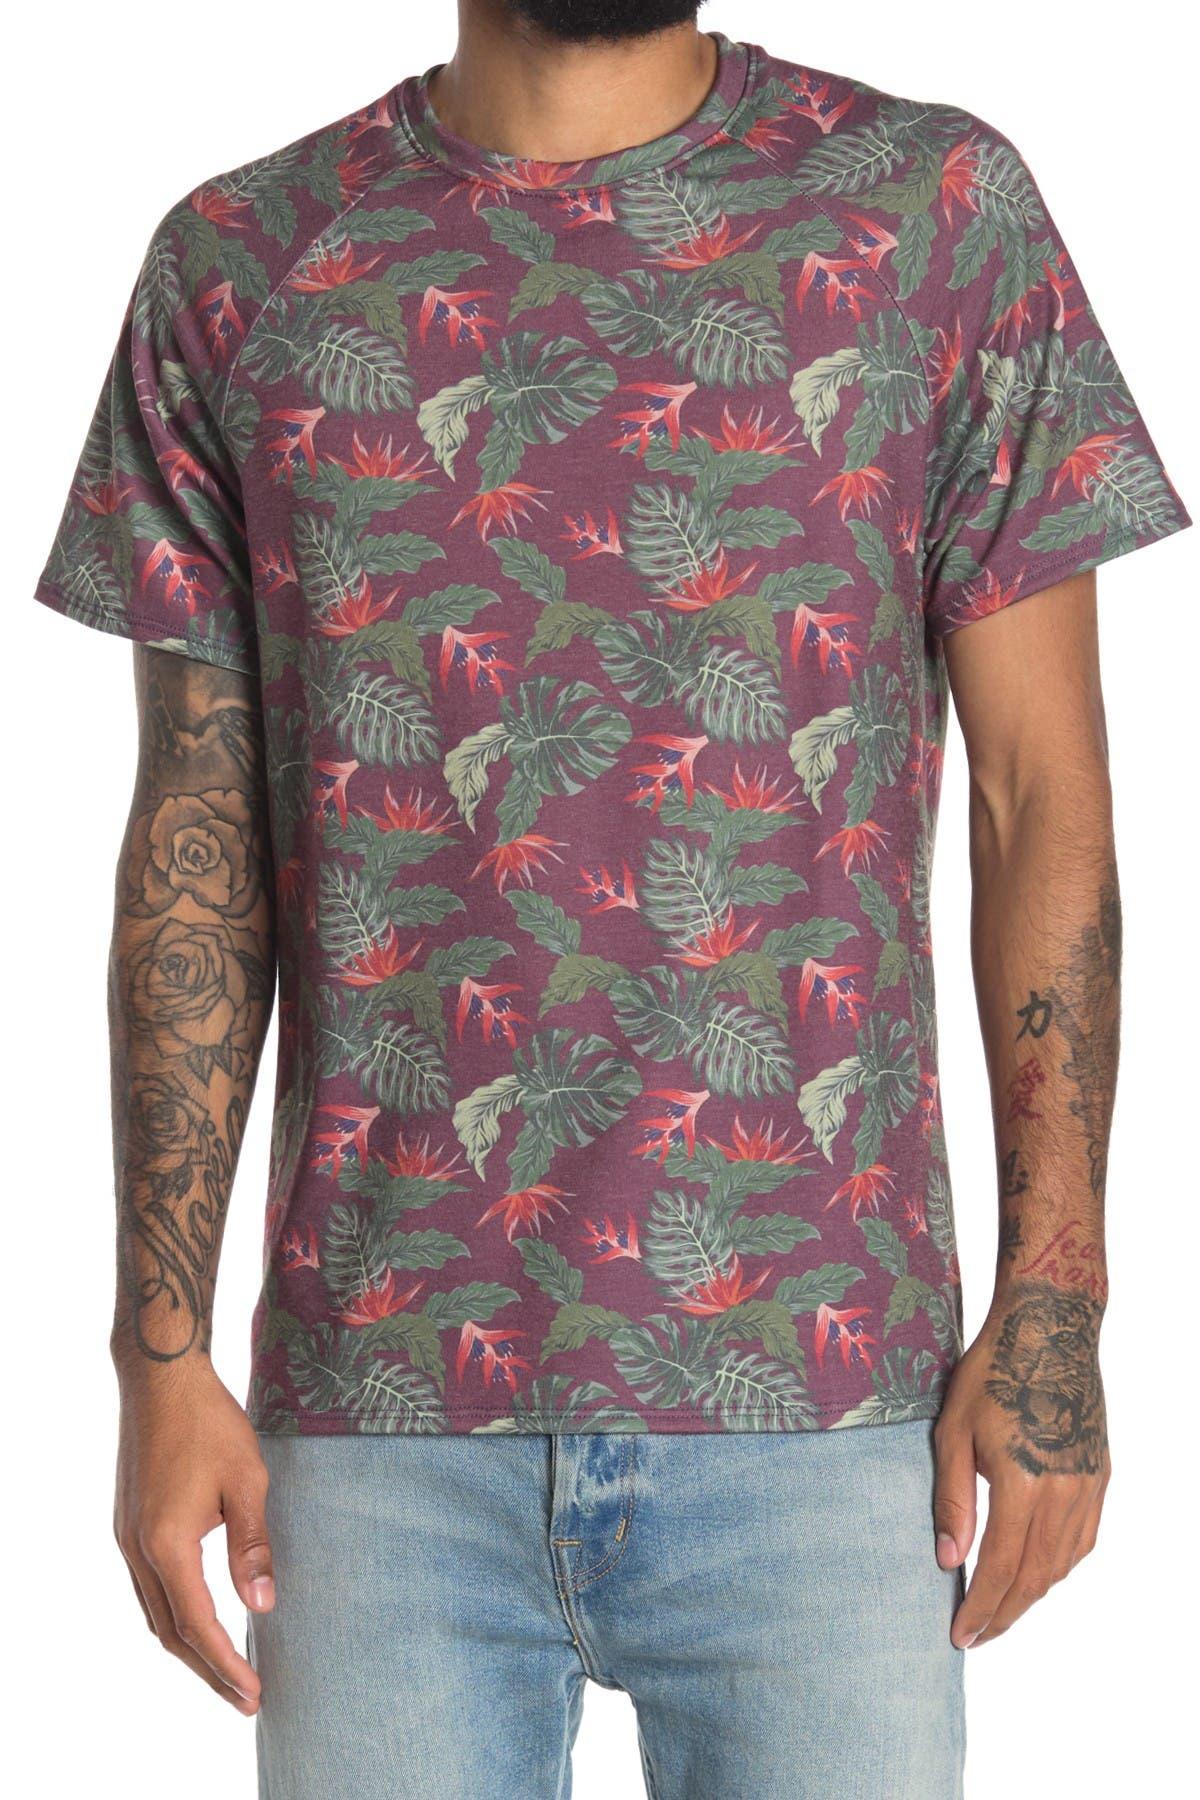 Image of Chillin Dylan Baja Man Tropical Print T-Shirt